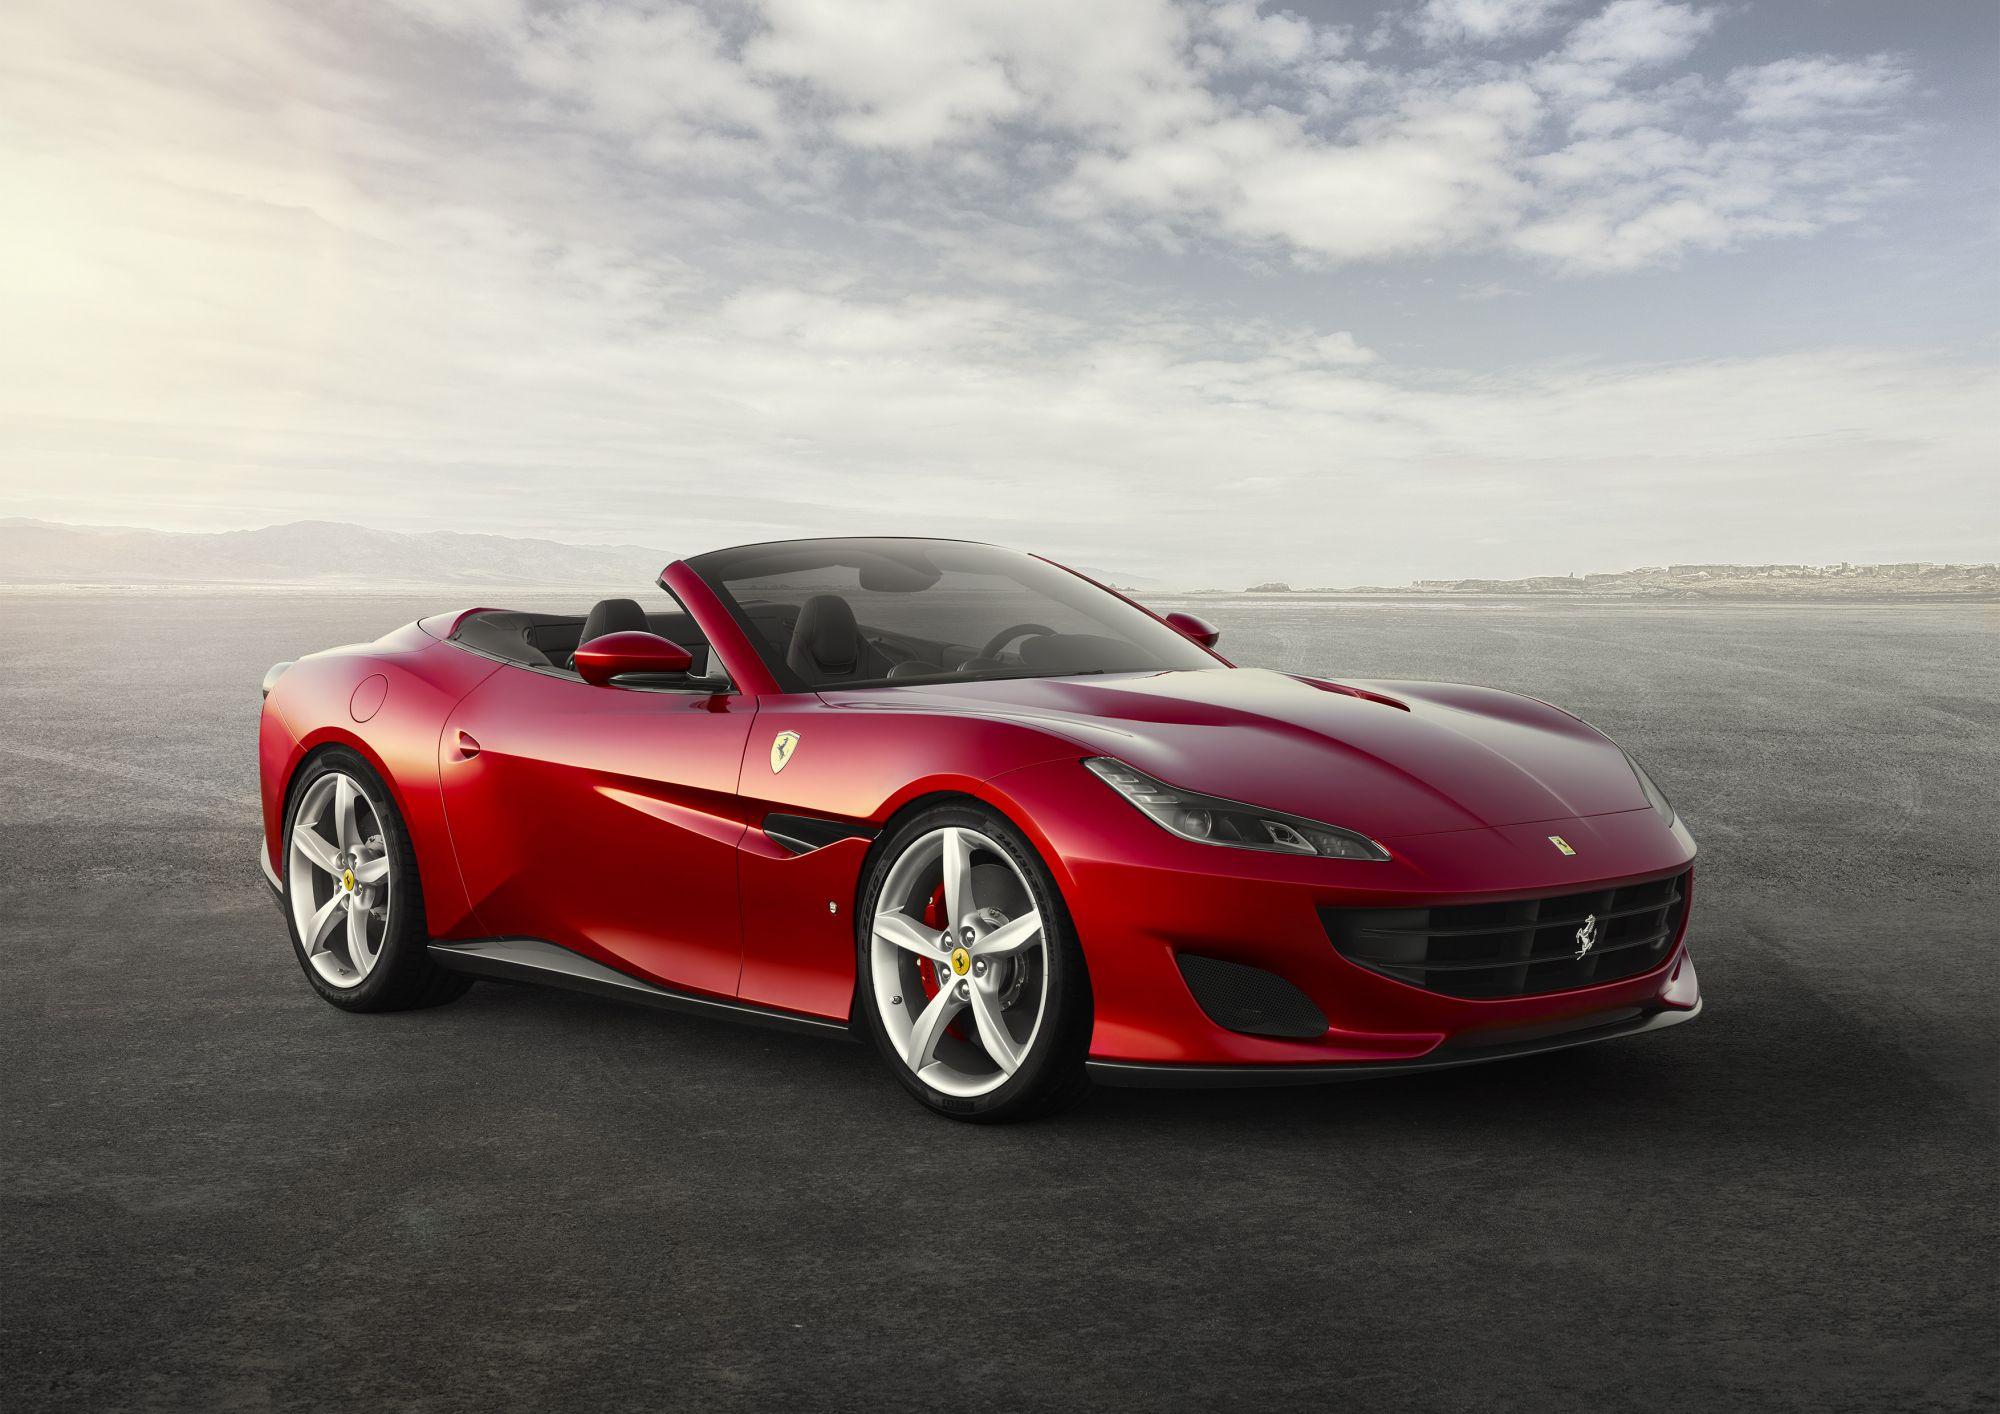 Ferrari Unveils The Portofino, An All-New Drop-Top